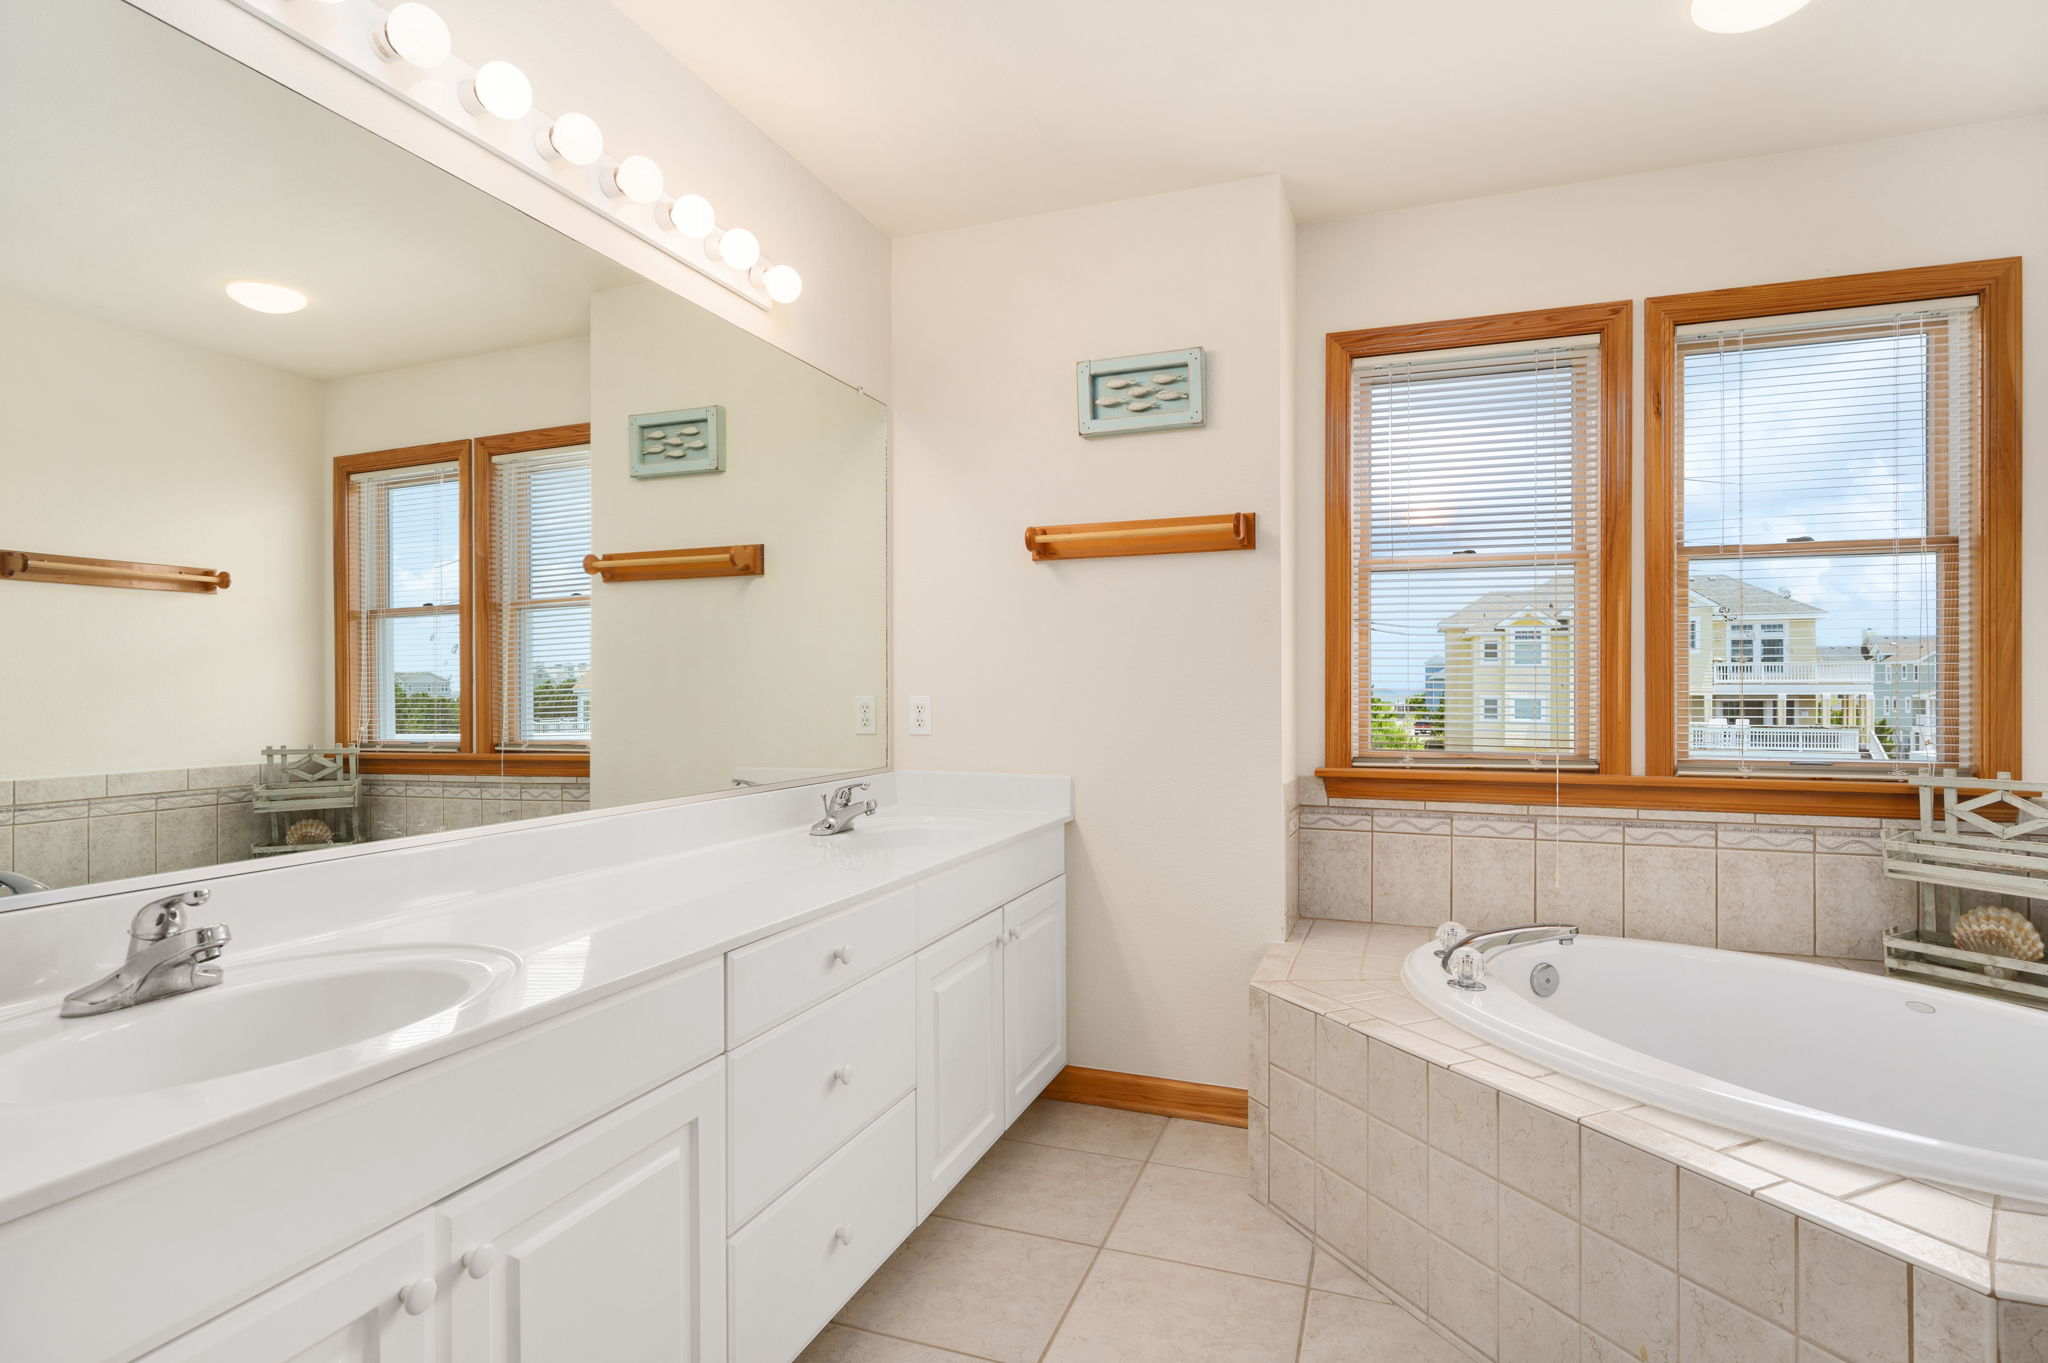 795 Mercury Road   Top Level Bedroom 7 - Private Bath